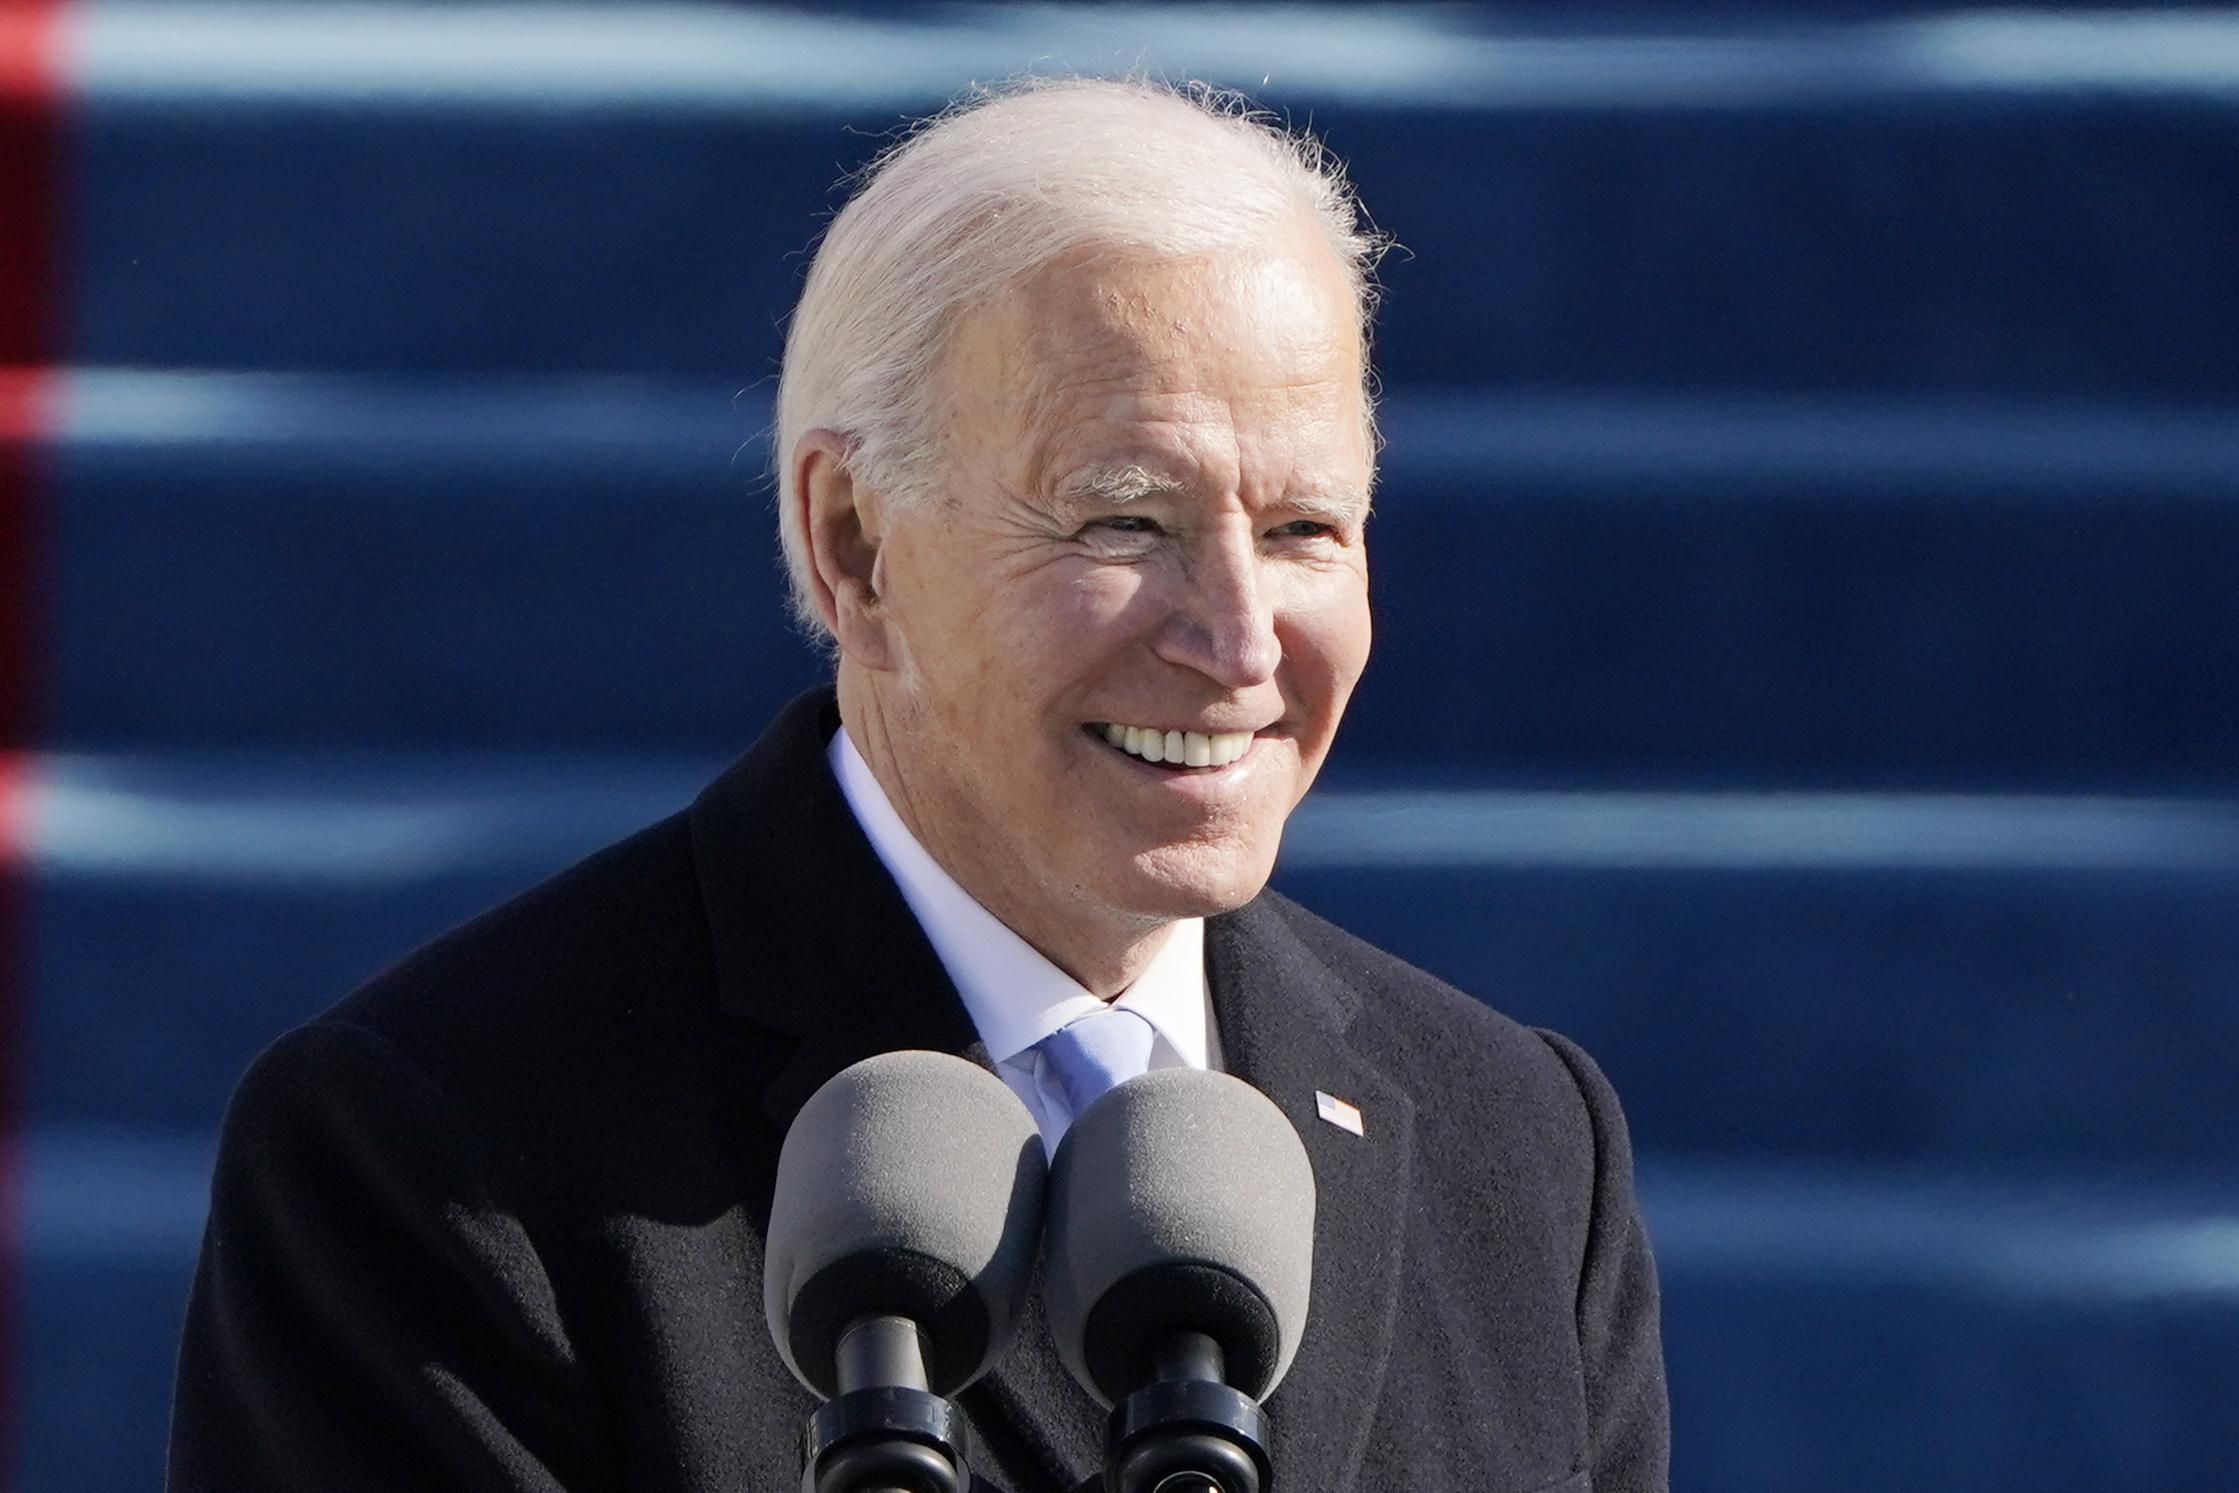 President Joe Biden on January 20, 2021 in Washington, DC. (Patrick Semansky-Pool/Getty Images)